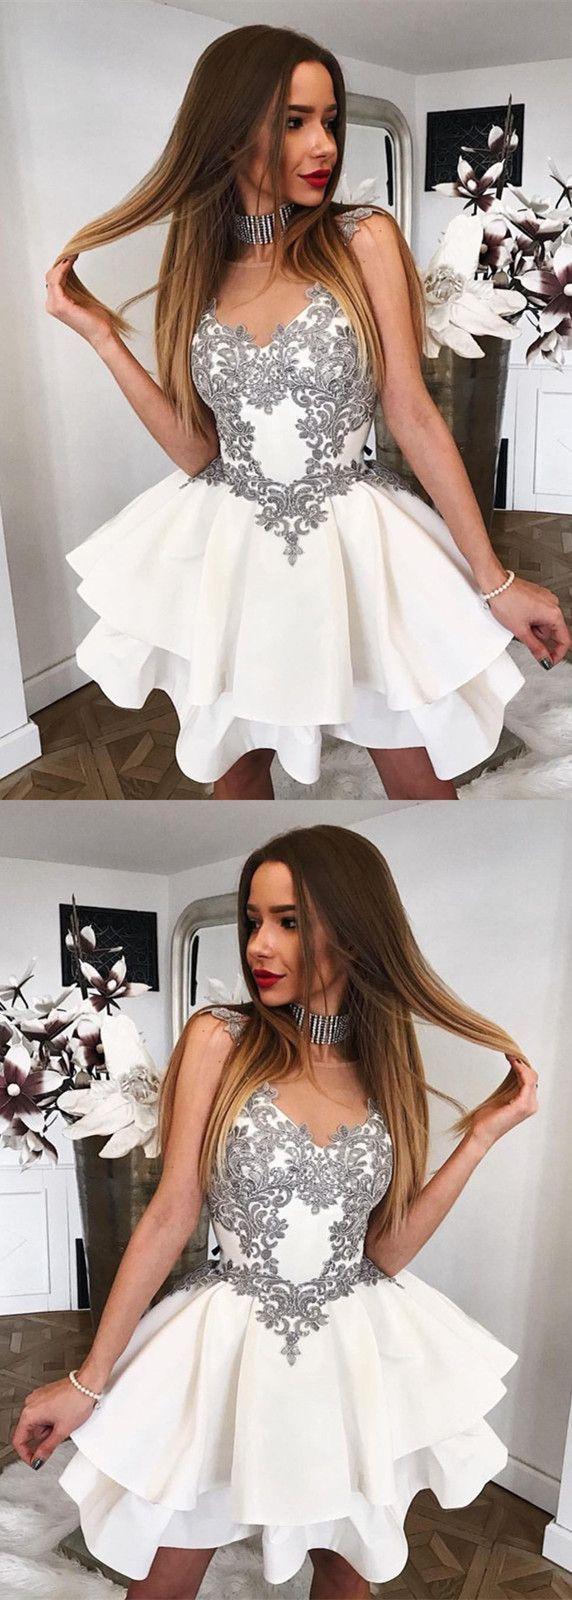 Short Gray Lace Appliques Scoop Neckline Ruffle Satin Homecoming Dresses #homecomingdresses #homecomingdressesshort